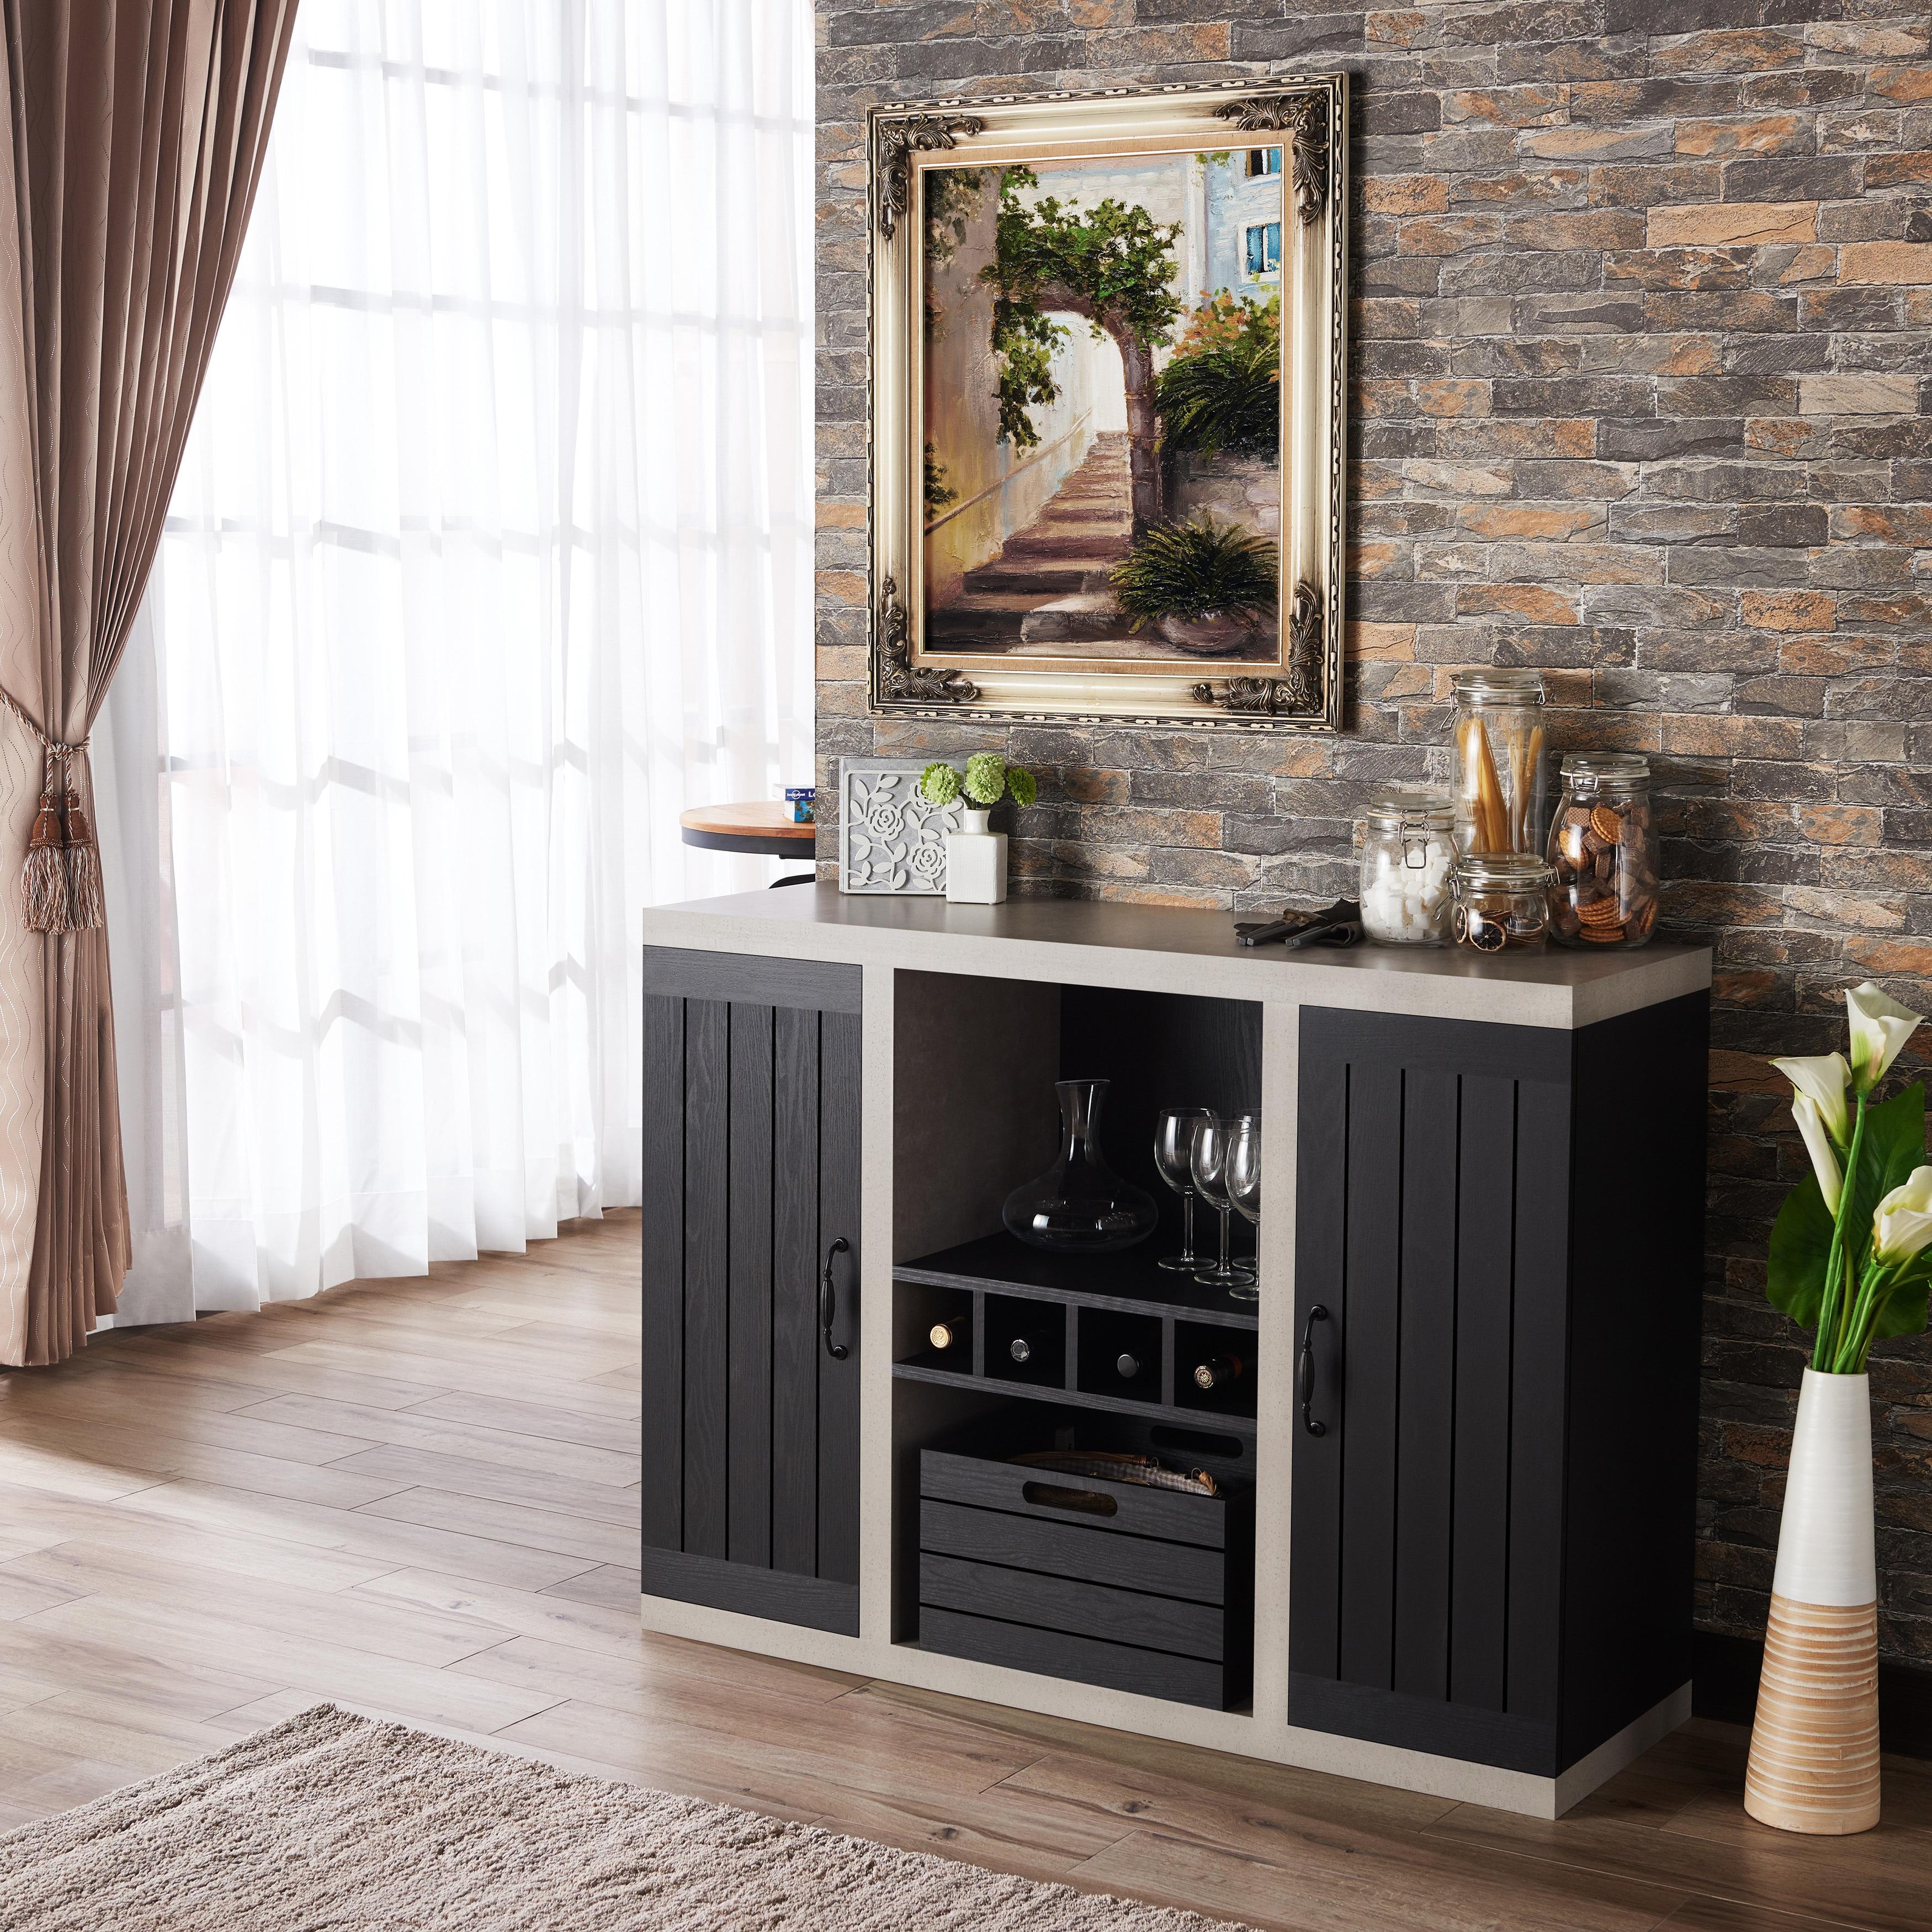 Furniture of america chelsean industrial cement like for Furniture of america gelenan industrial cement like multi storage buffet